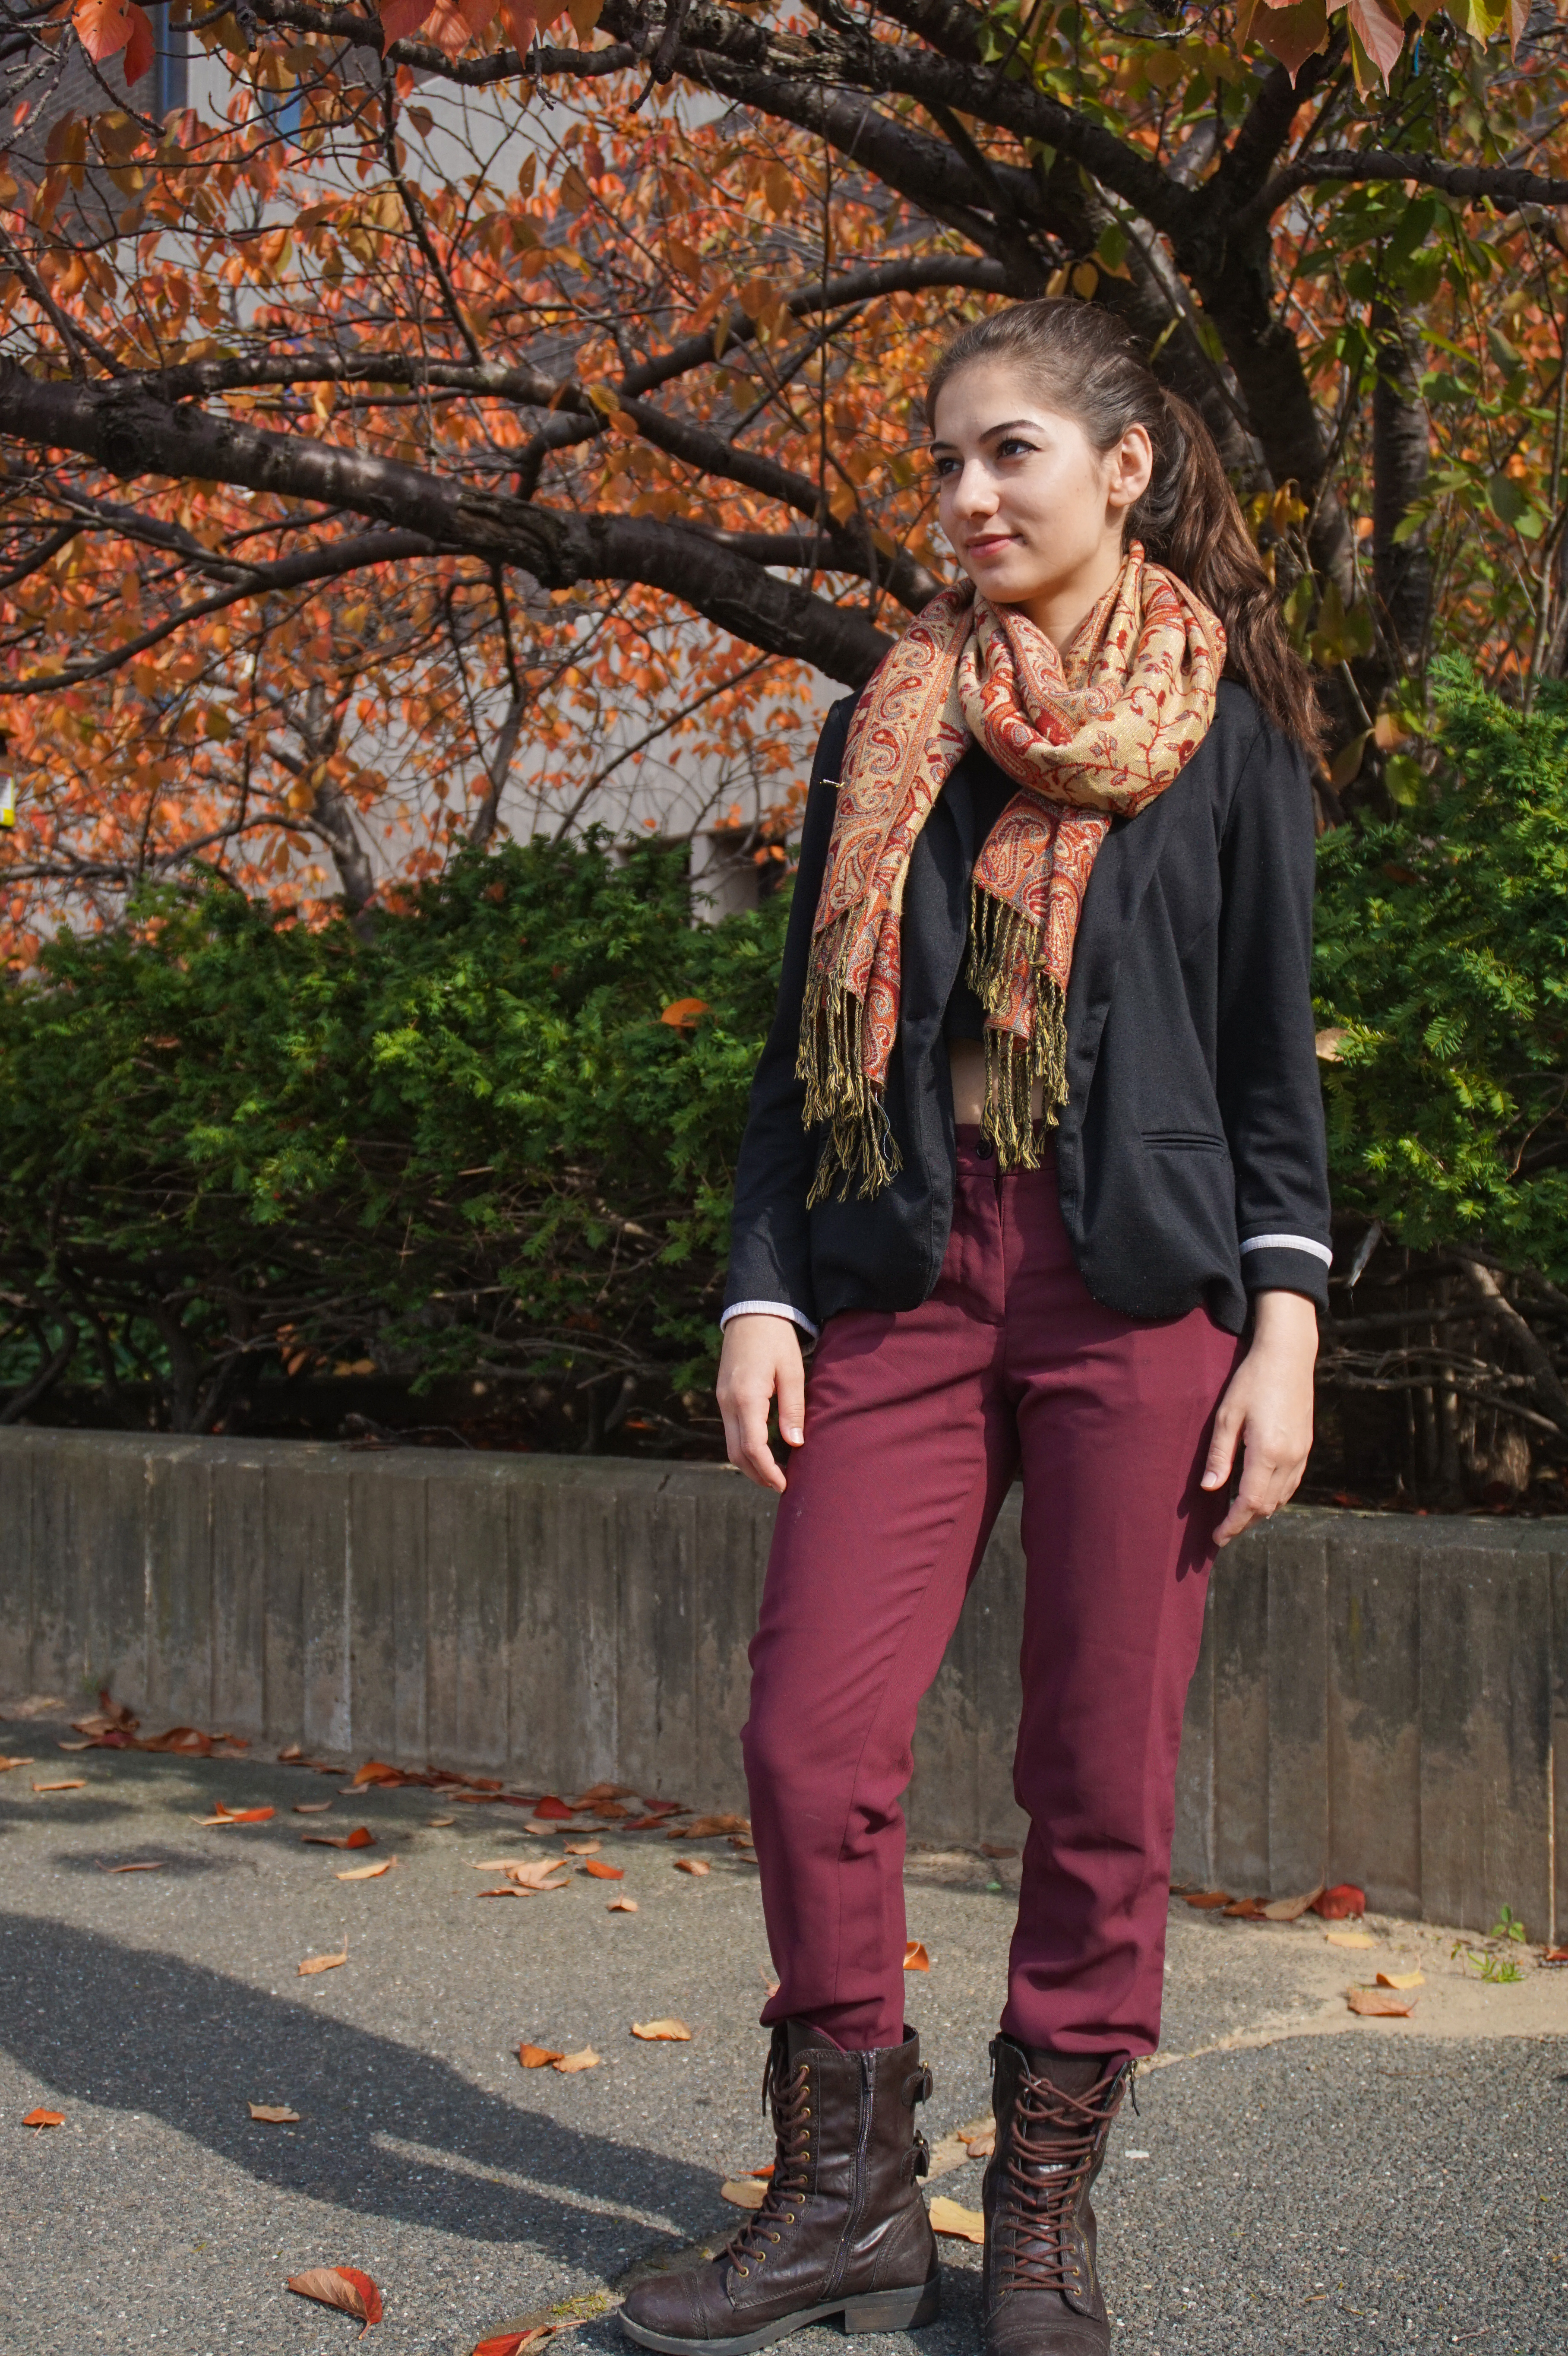 Rahila Babar, junior English major, takes a candid on Wednesday, Oct. 29, 2014. (HEATHER KHALIFA / THE STATESMAN)